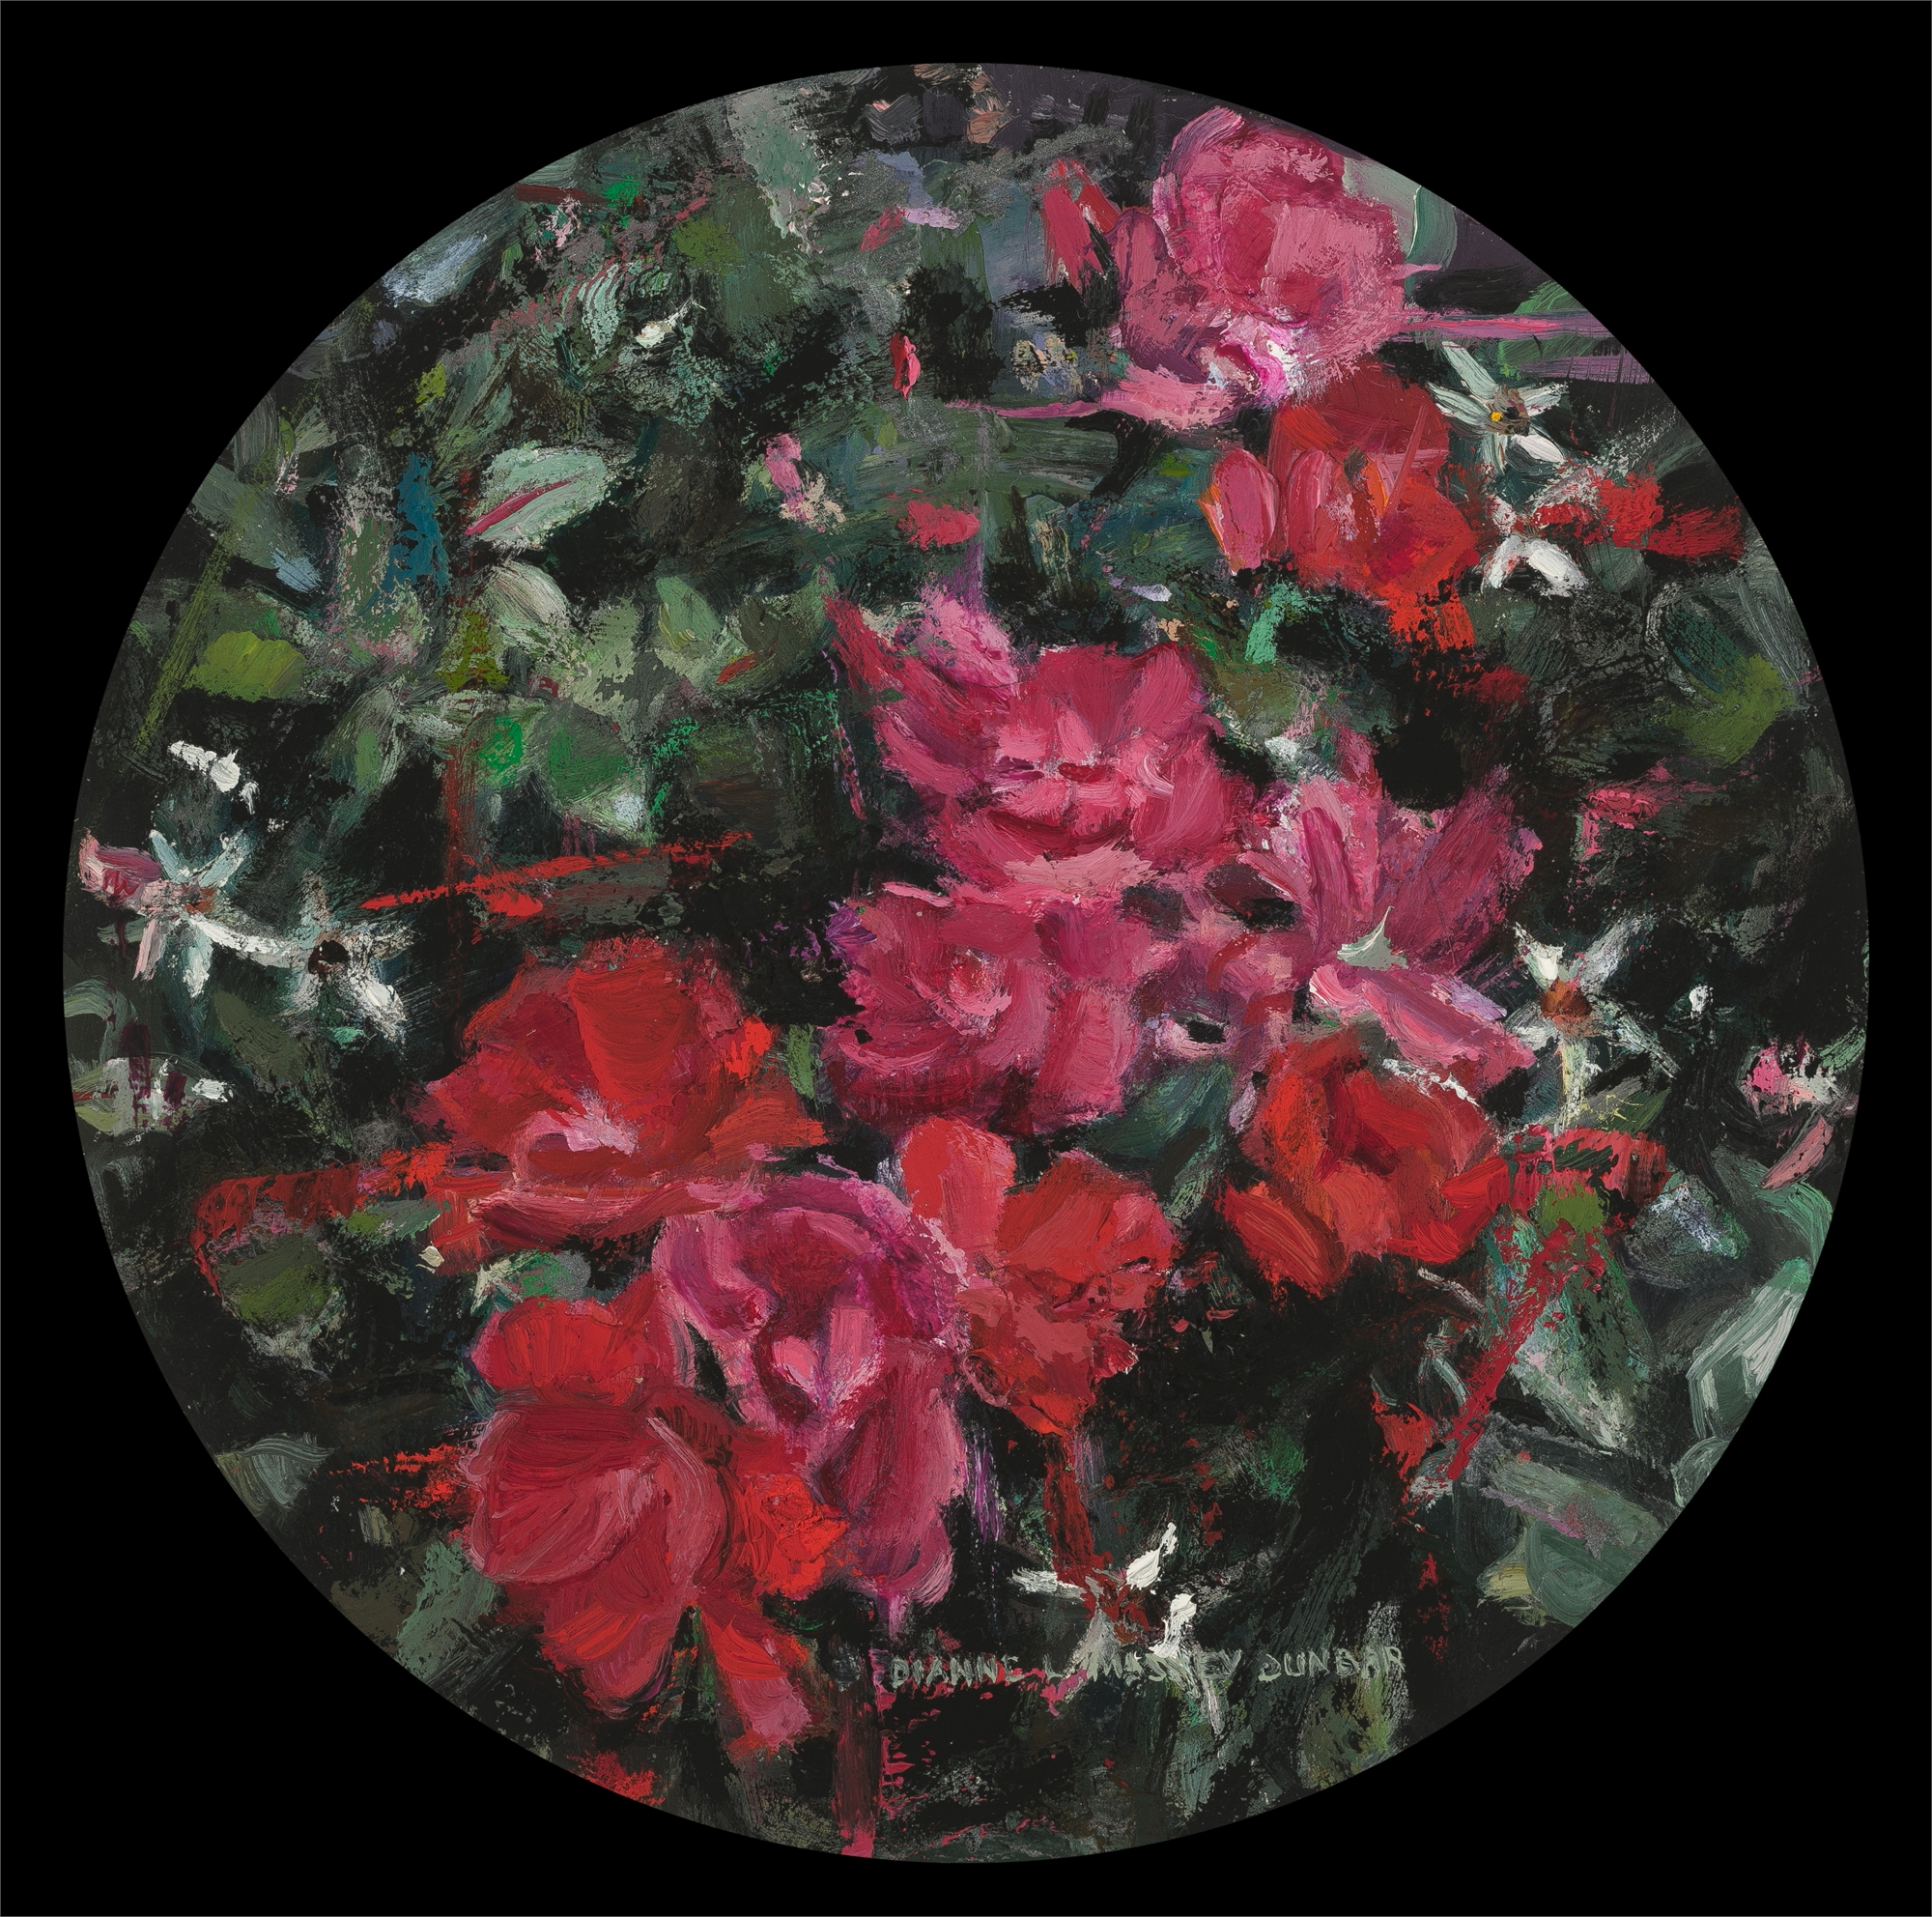 Shrub Roses by Dianne L Massey Dunbar